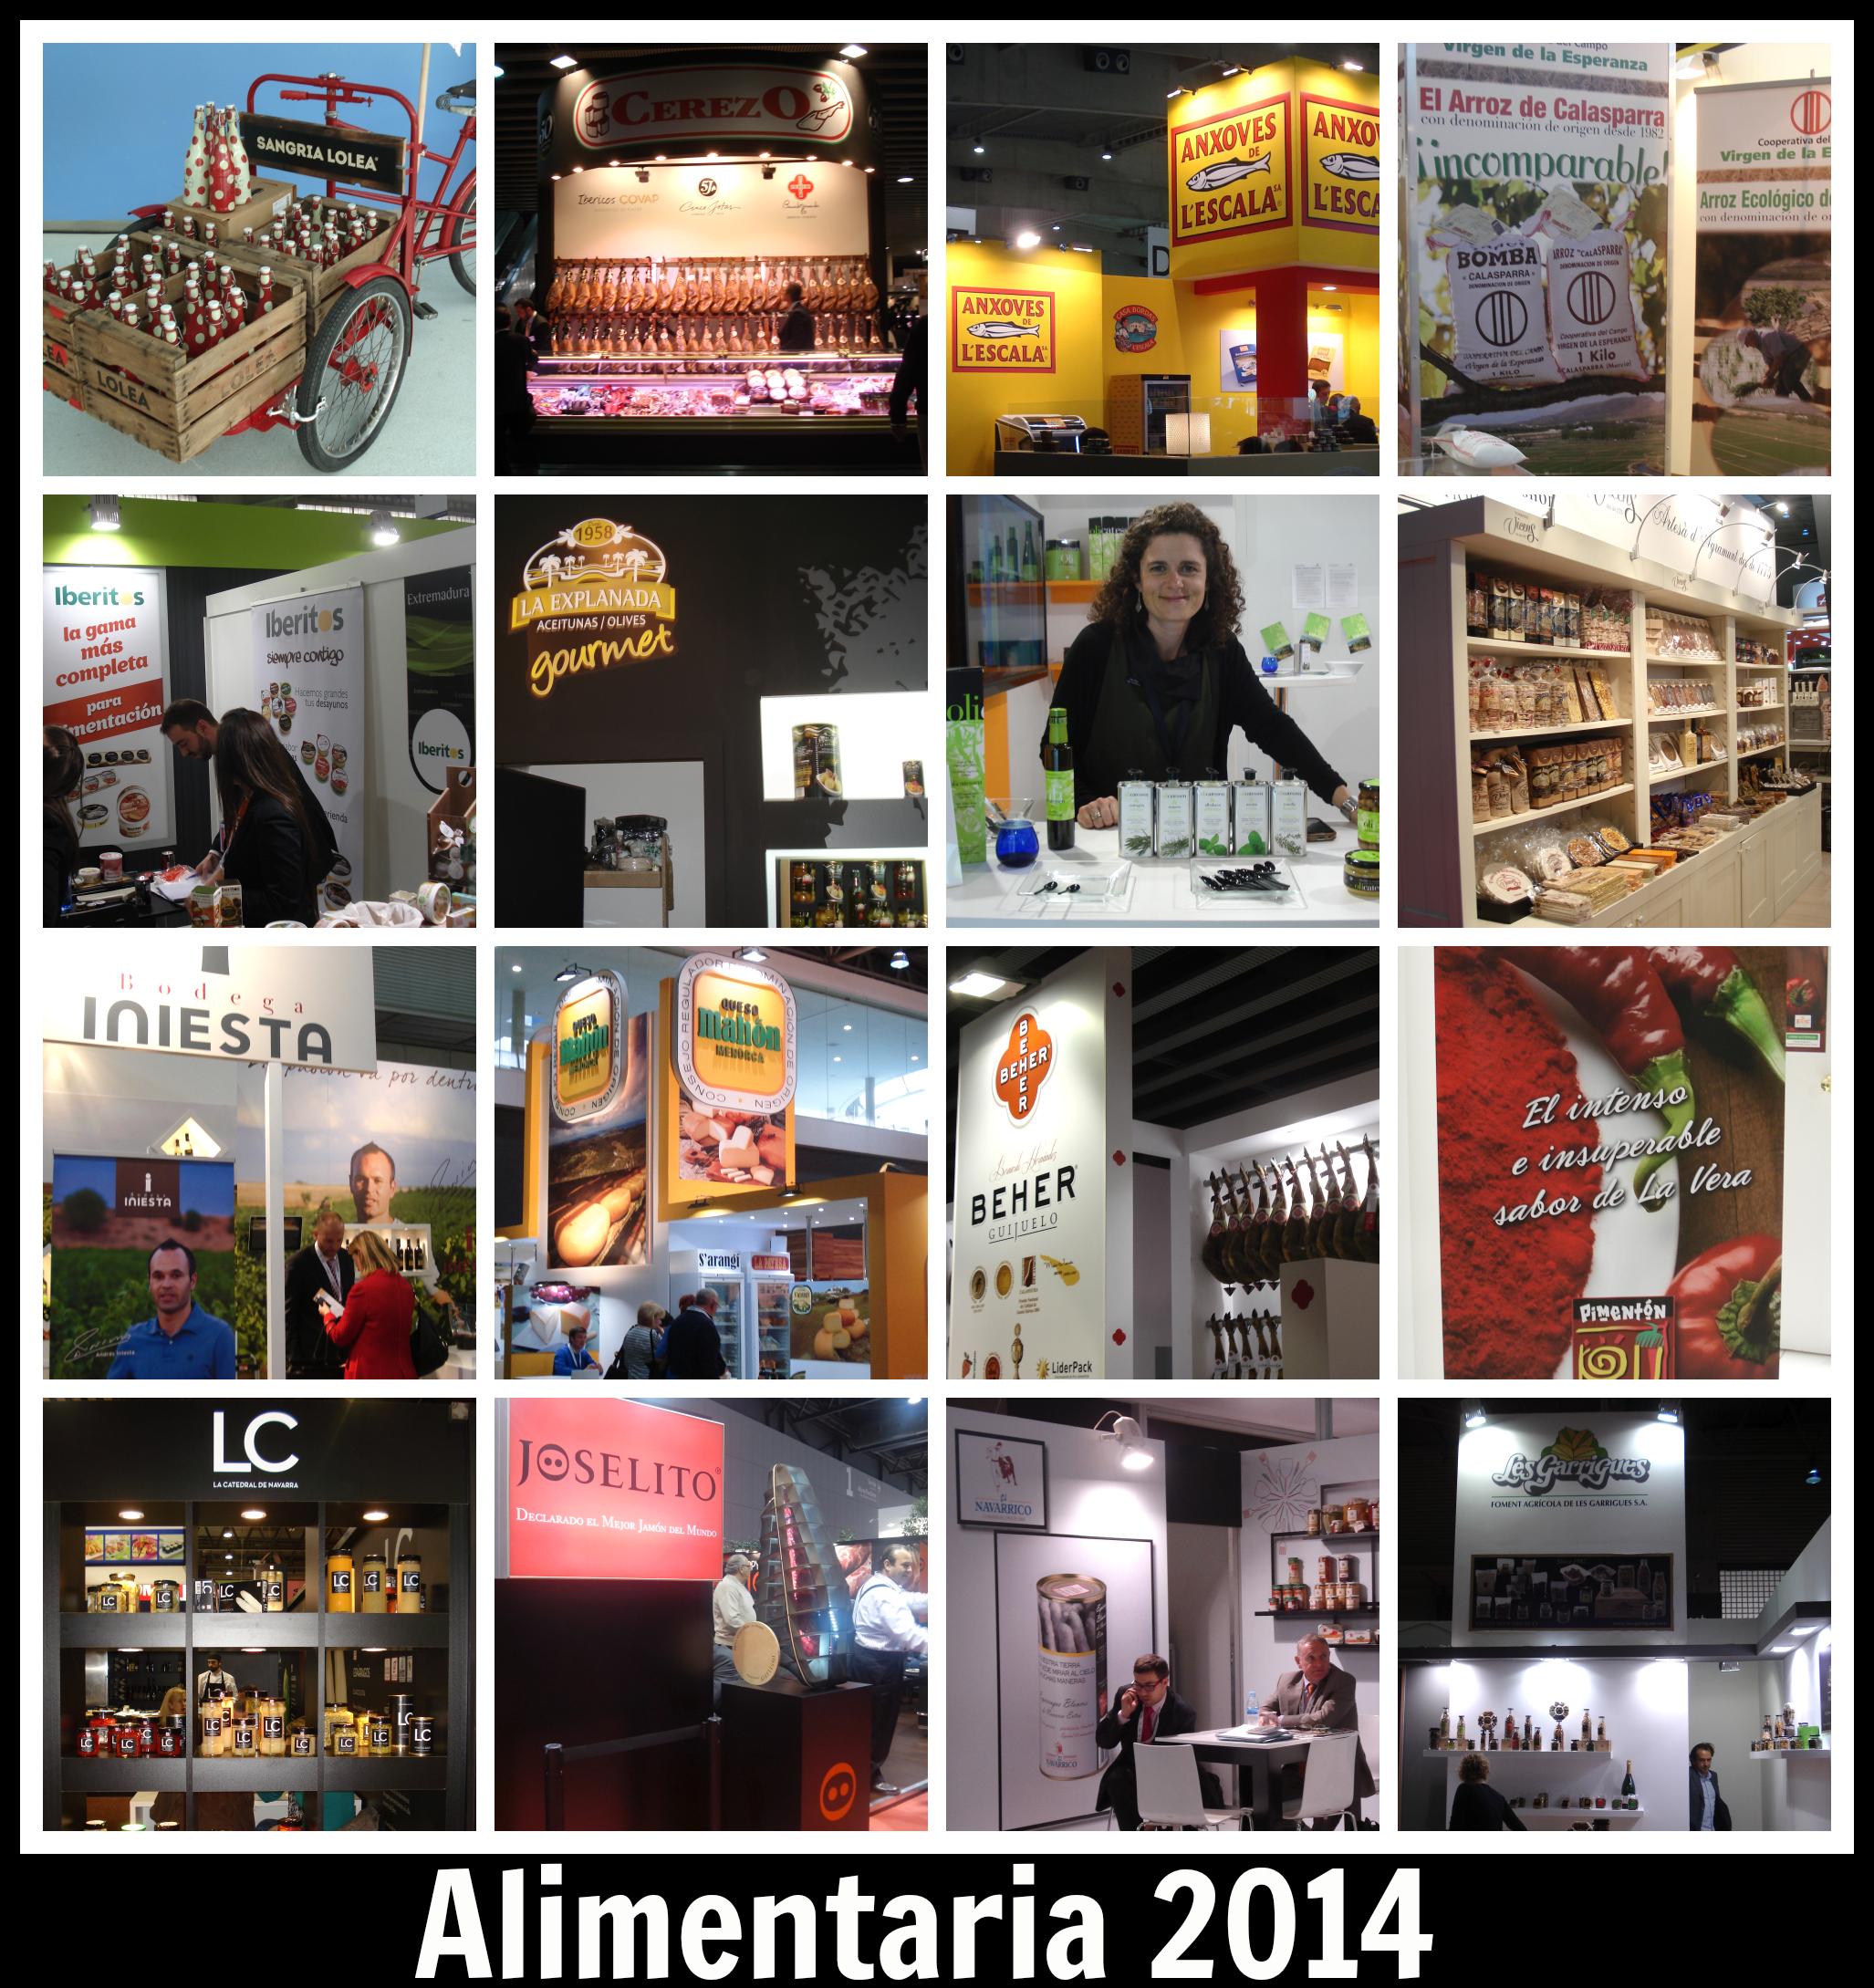 Alimentaria 2014